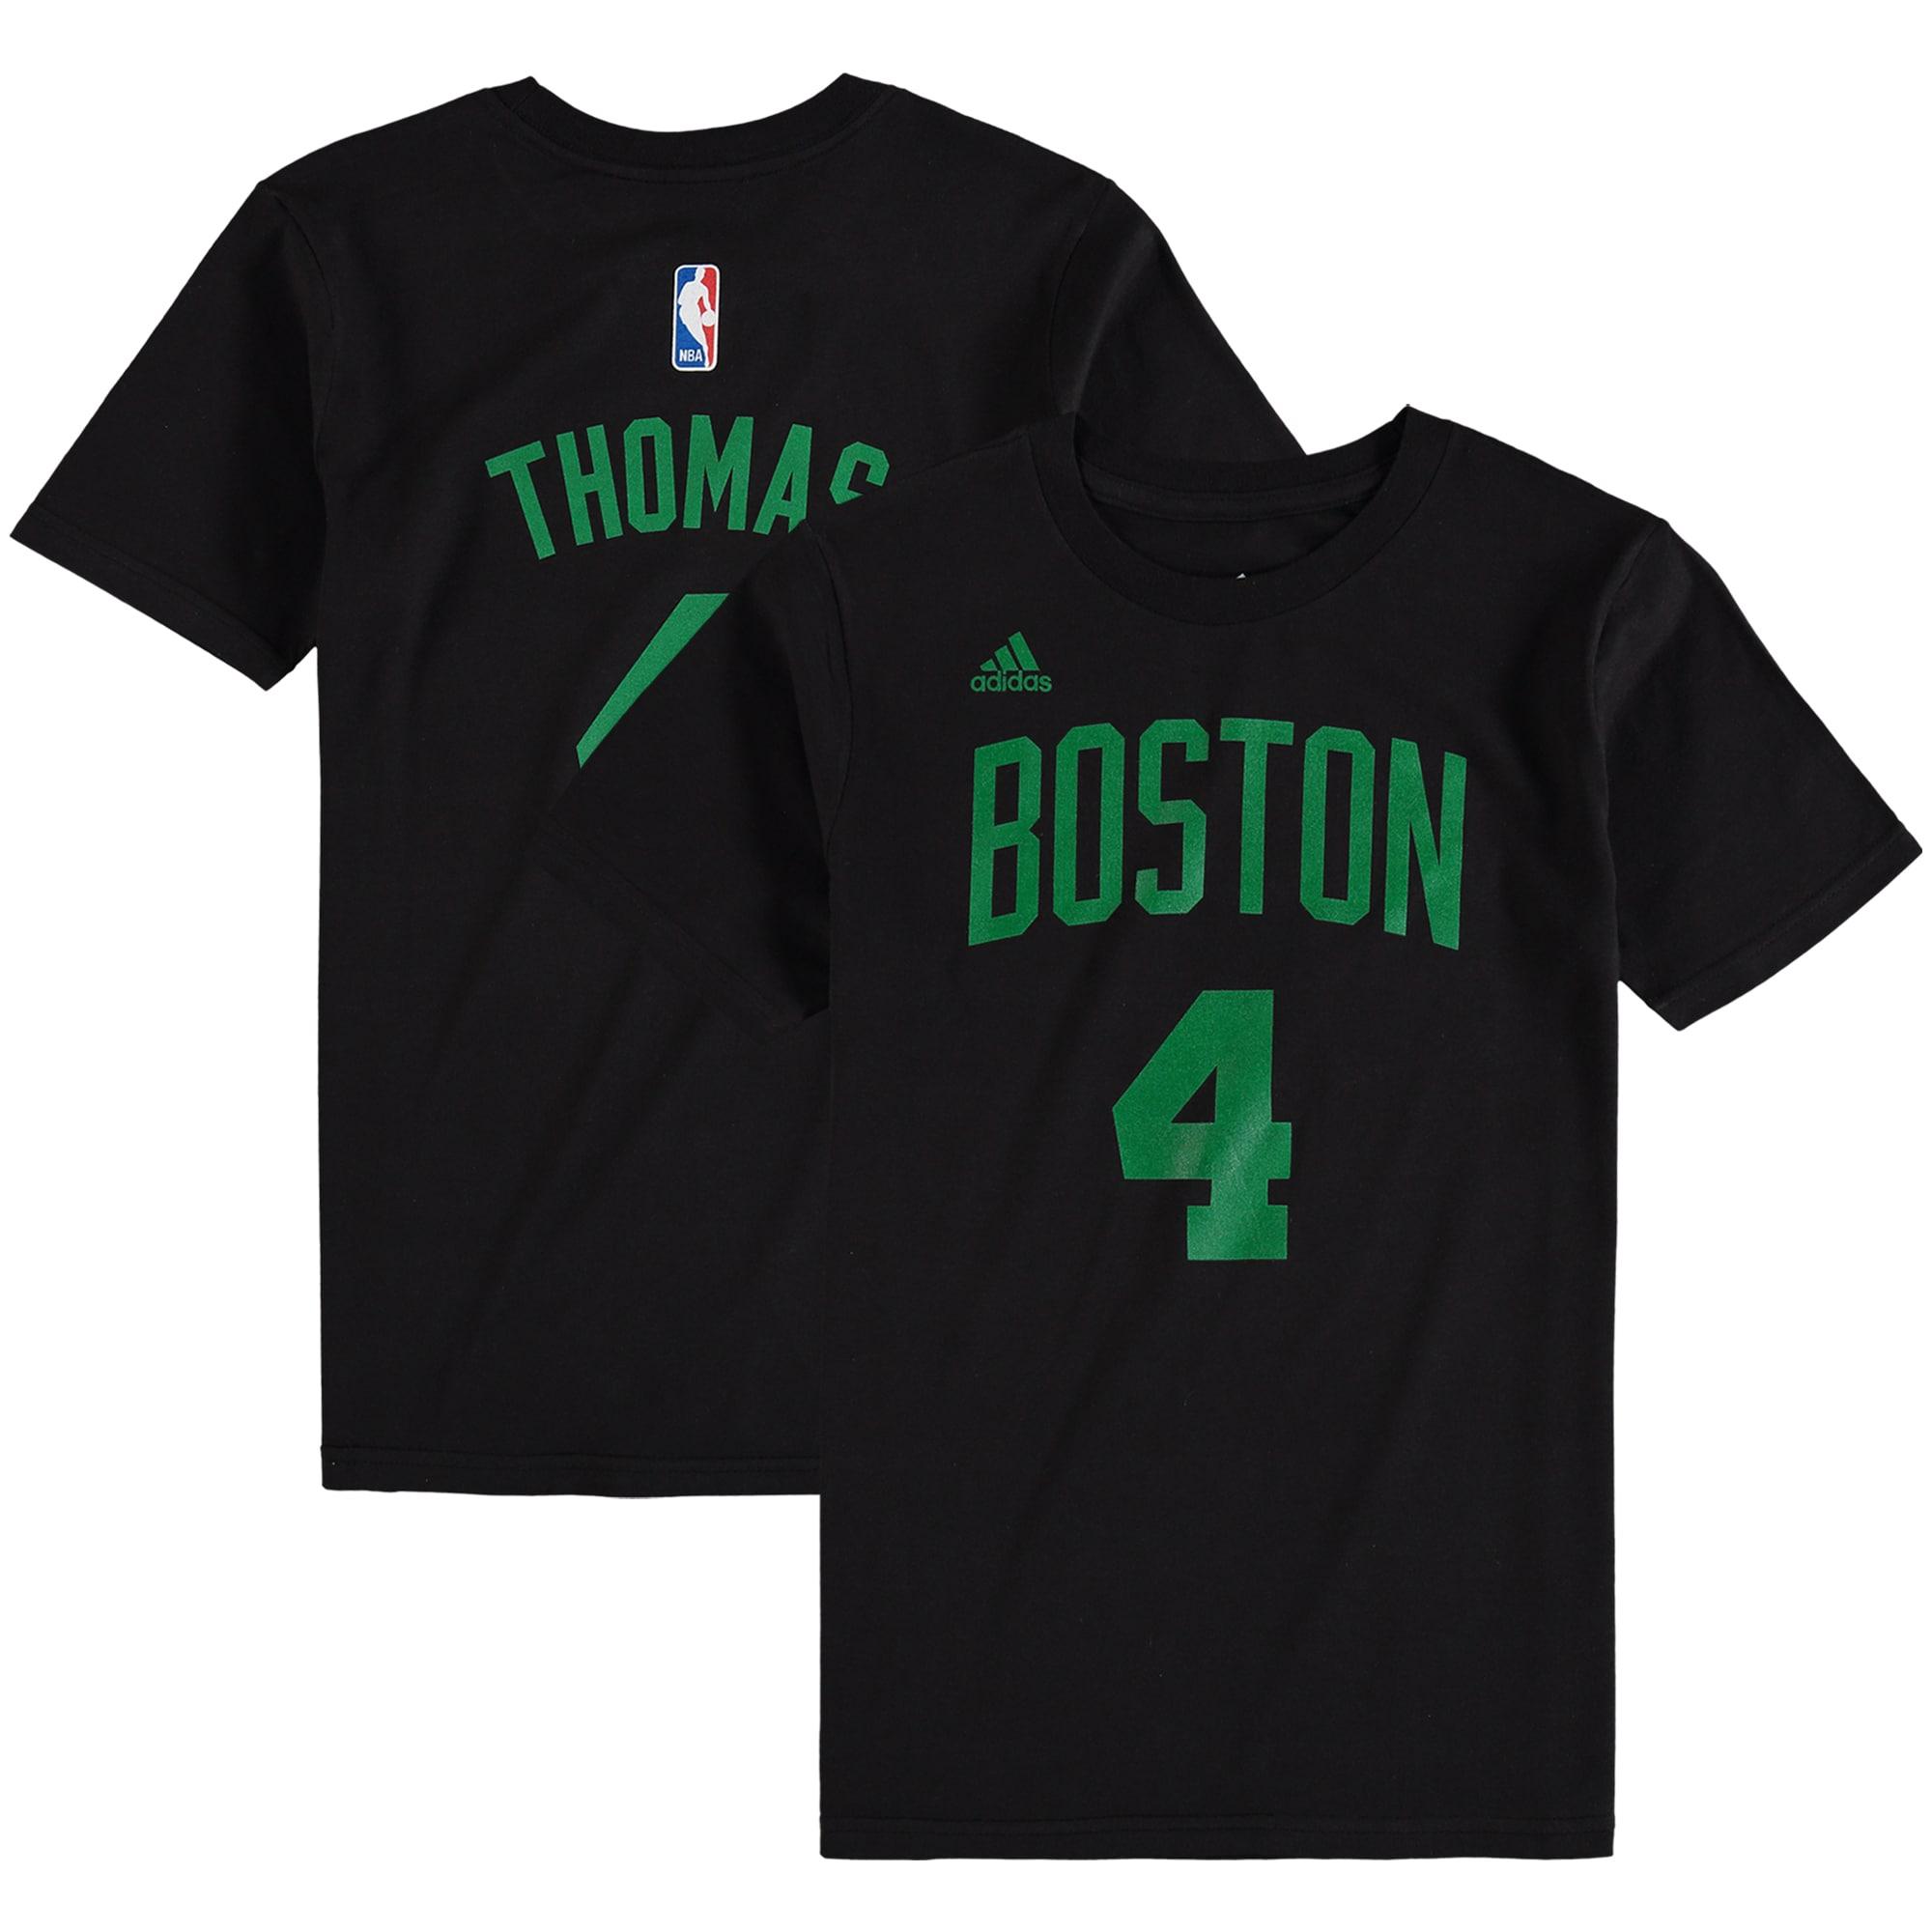 Isaiah Thomas Boston Celtics adidas Youth Game Time Flat Name & Number T-Shirt - Black